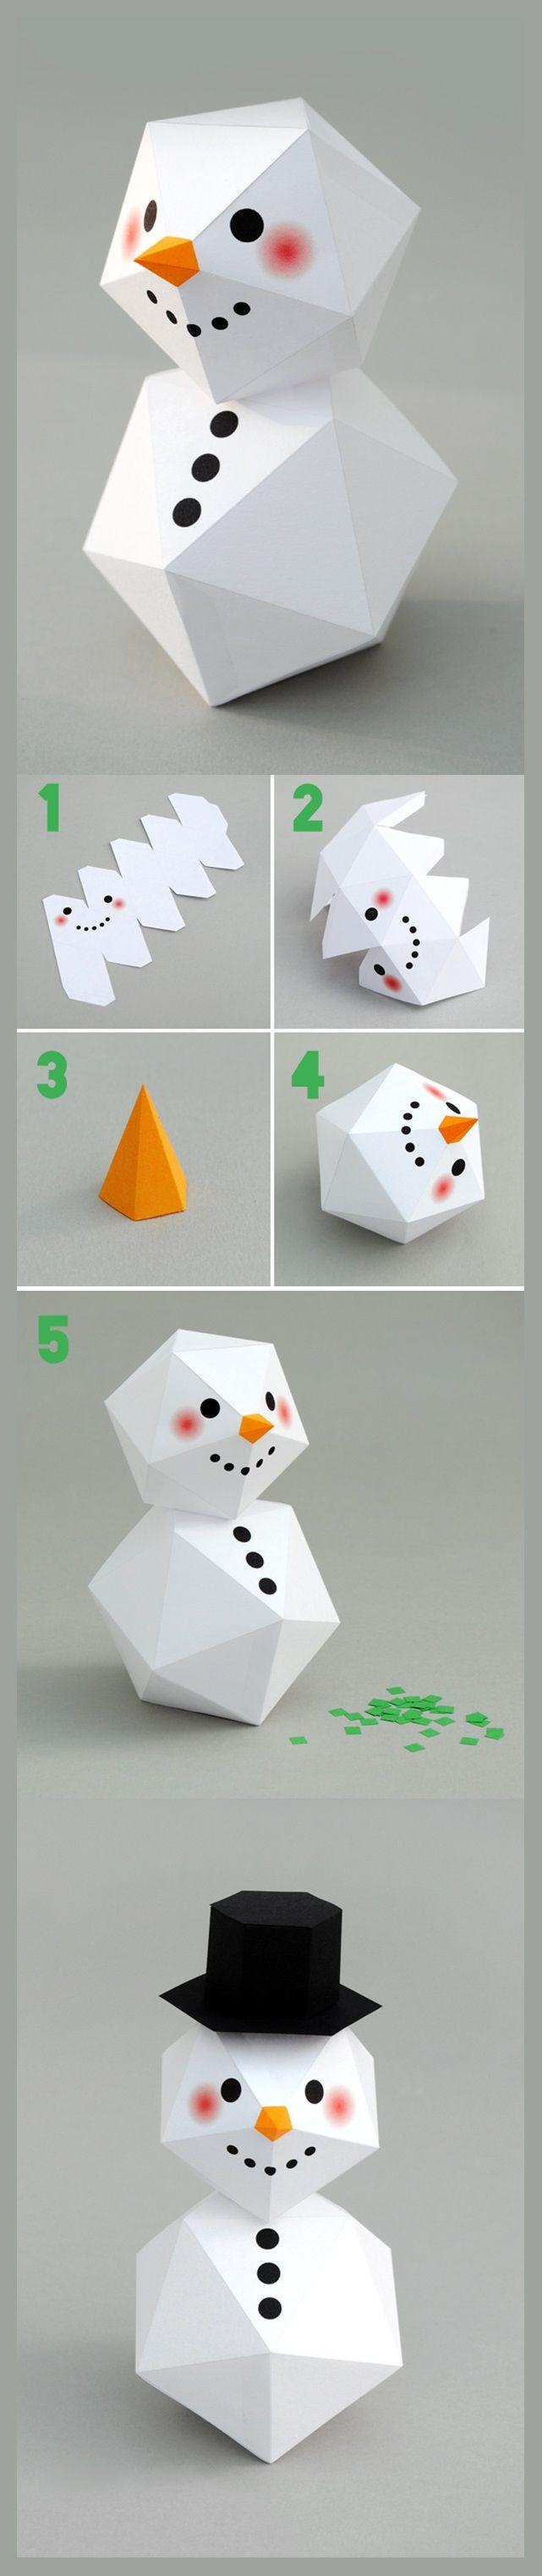 http://www.minieco.co.uk/images/sept14/snowman2.pdf http://www.minieco.co.uk/images/sept14/snowman1.pdf